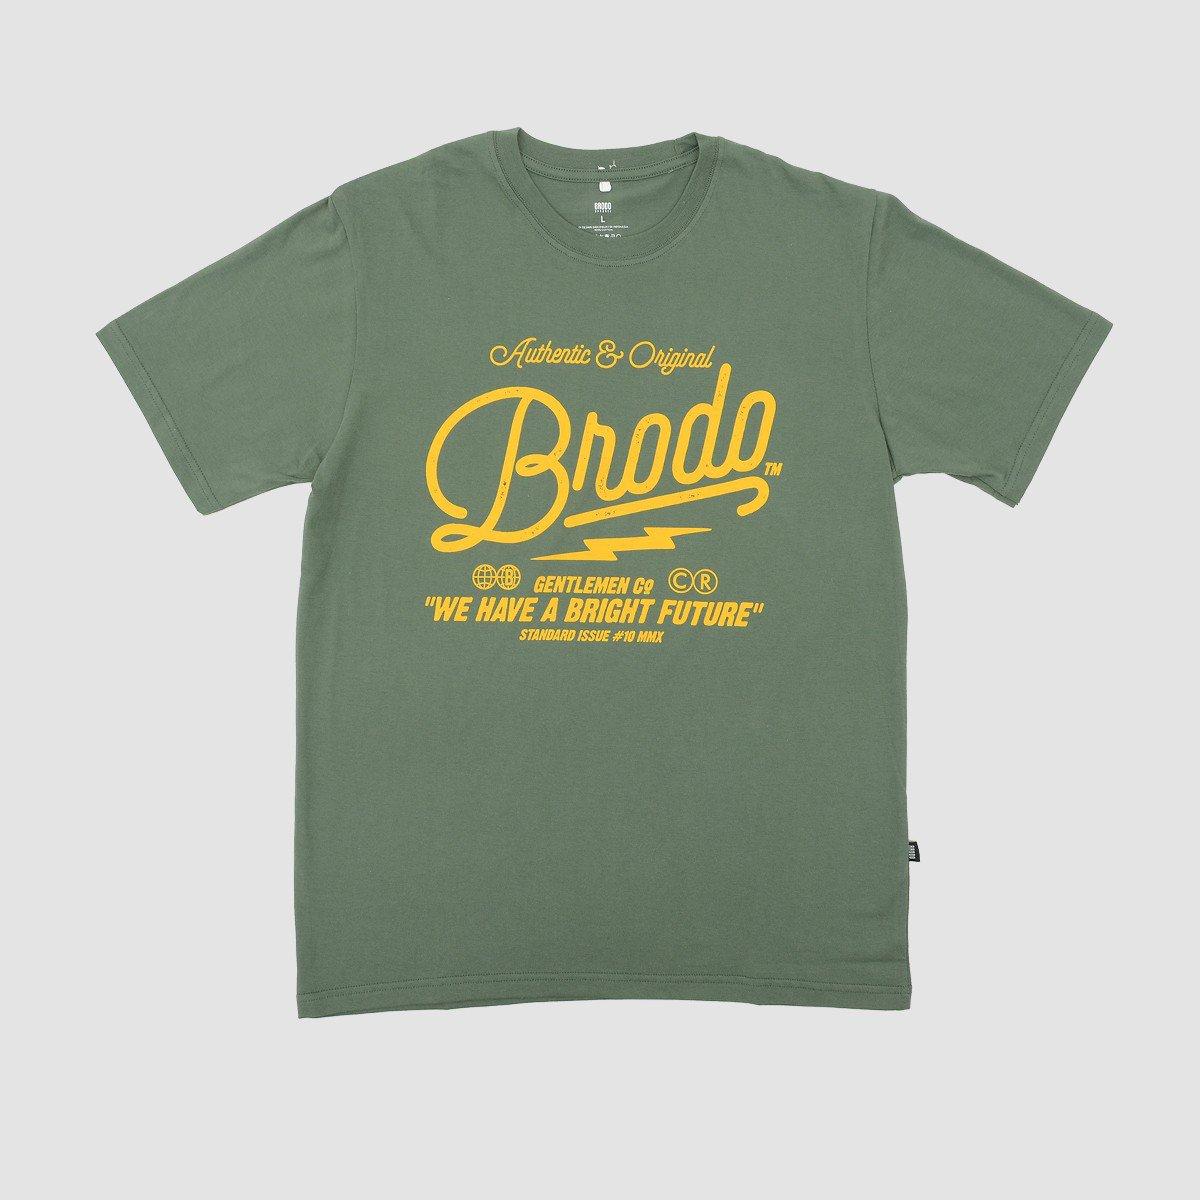 BRODO - Pakaian Pria Inscription Green T-Shirt